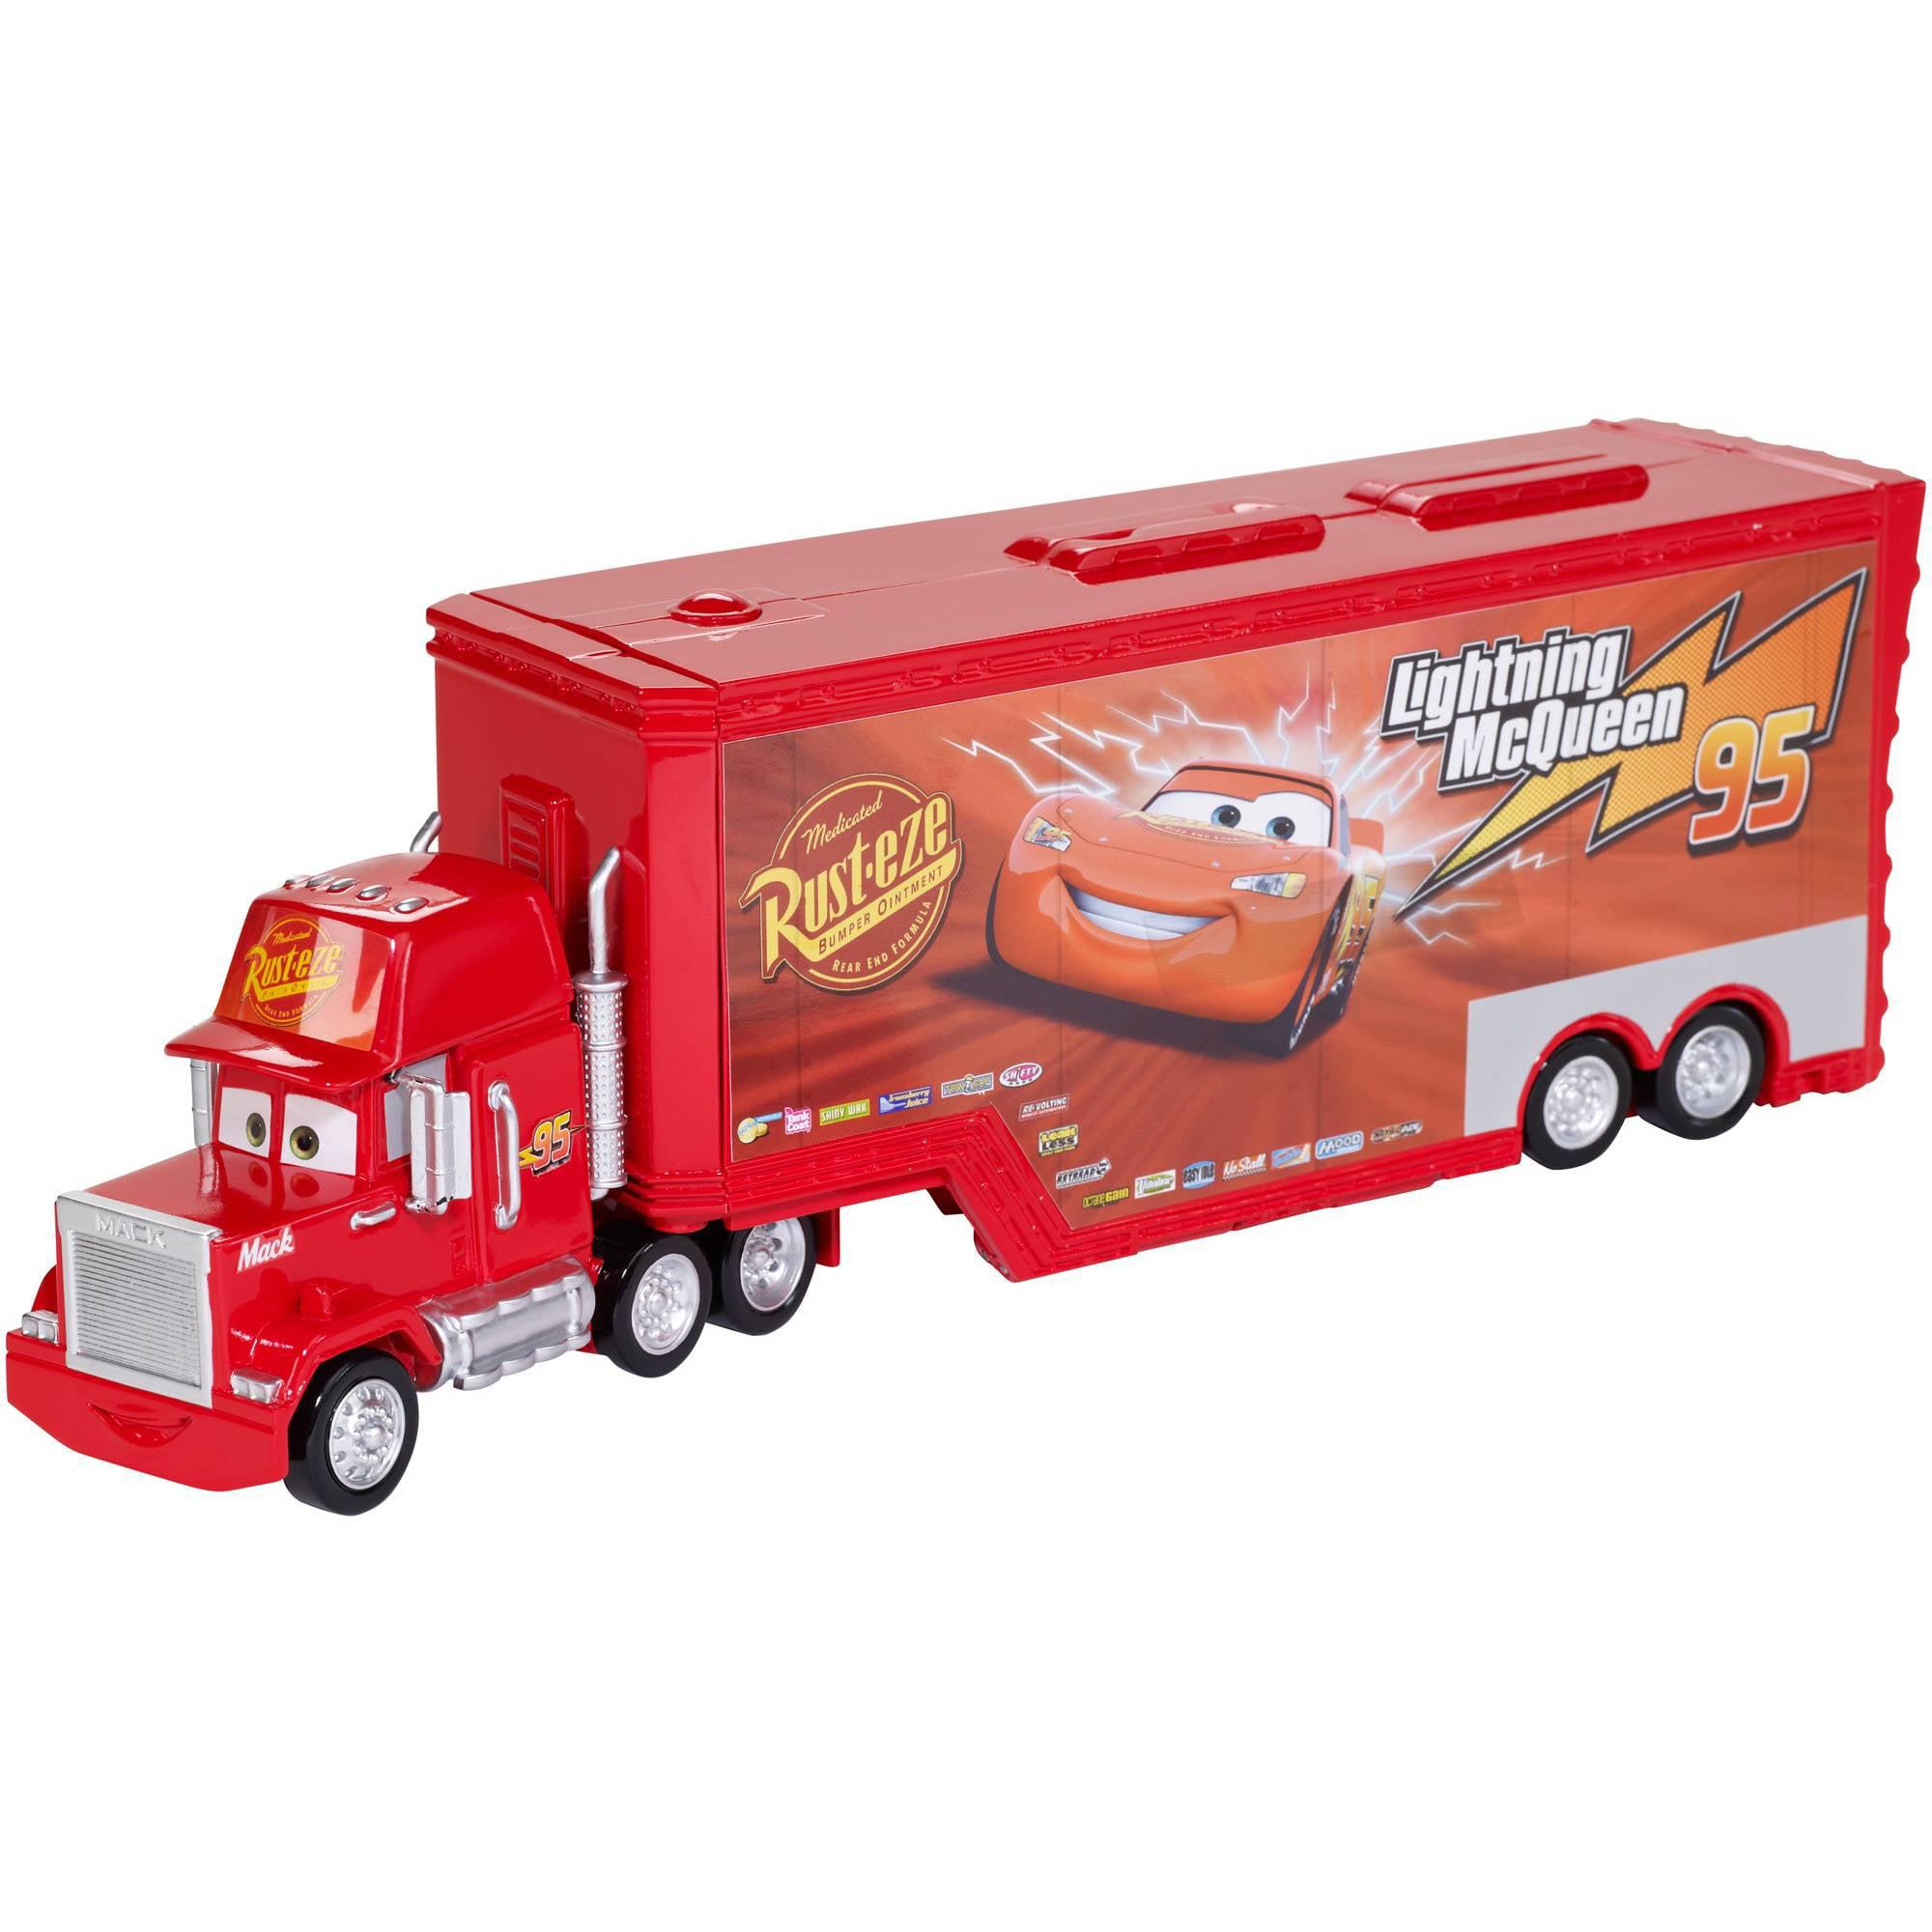 Disney Pixar Cars Mack Truck Playset